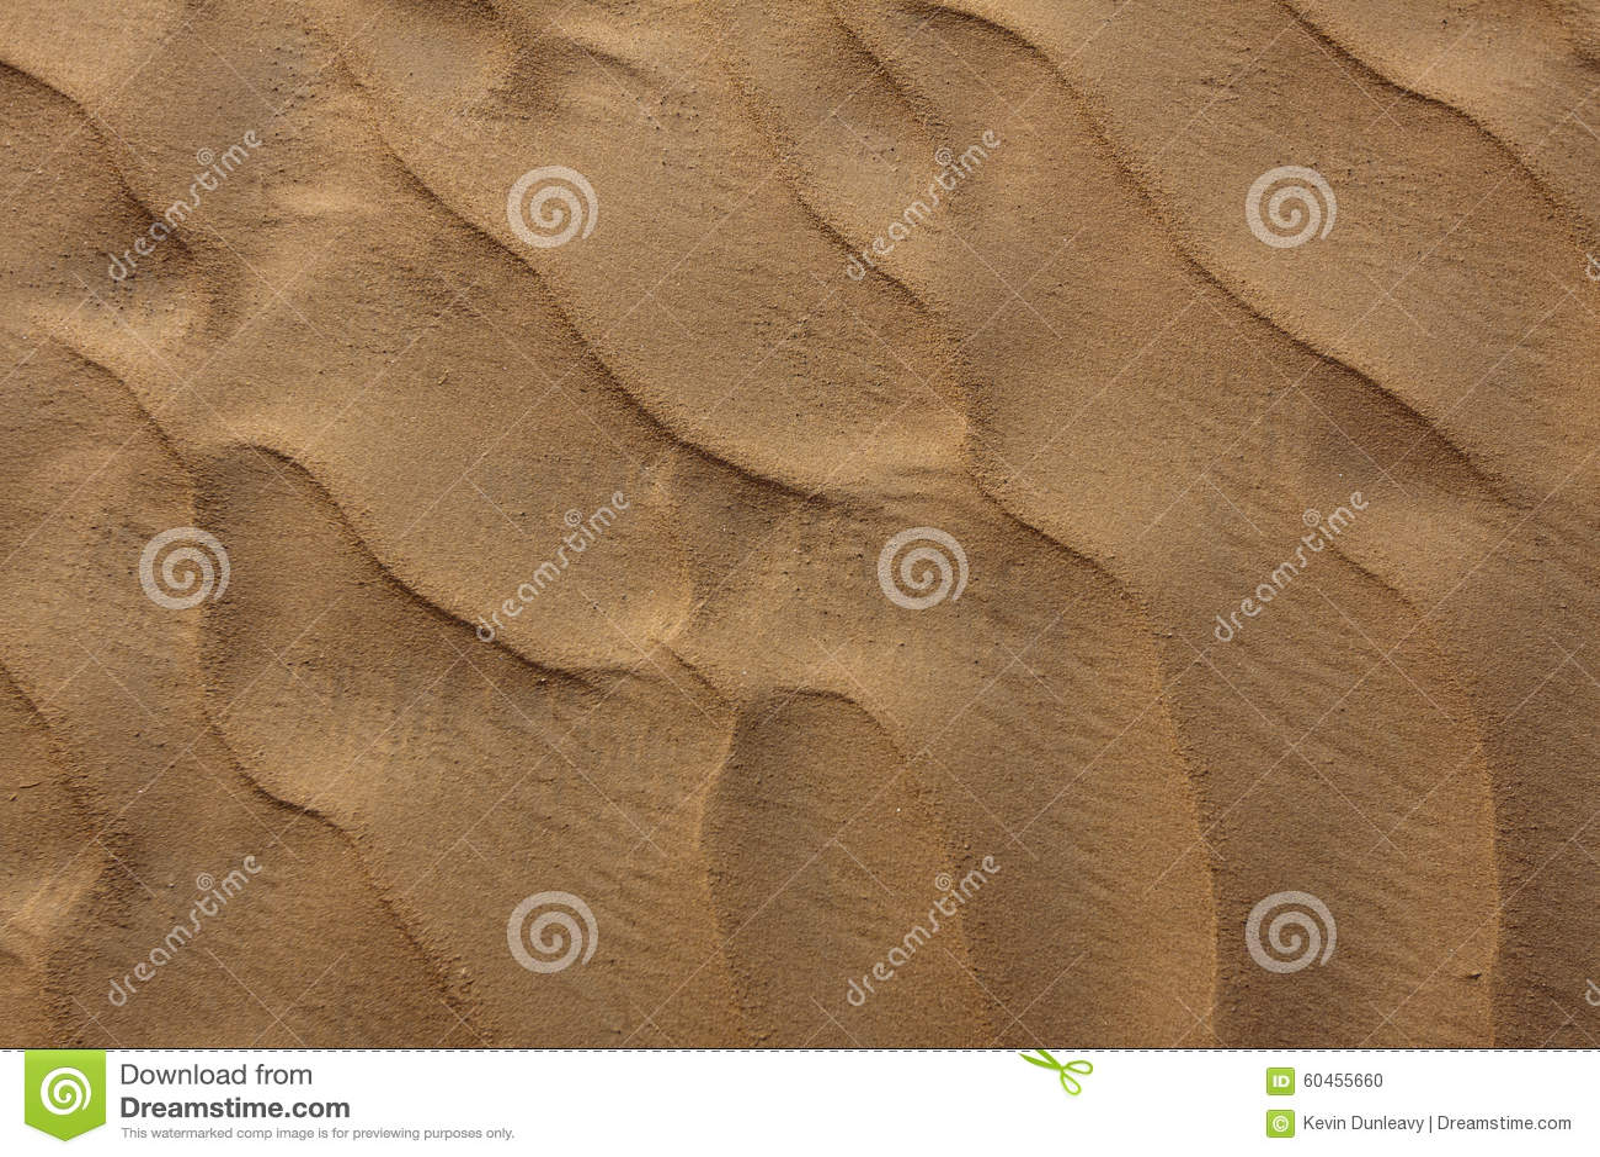 Piasek diun czochra w pustyni